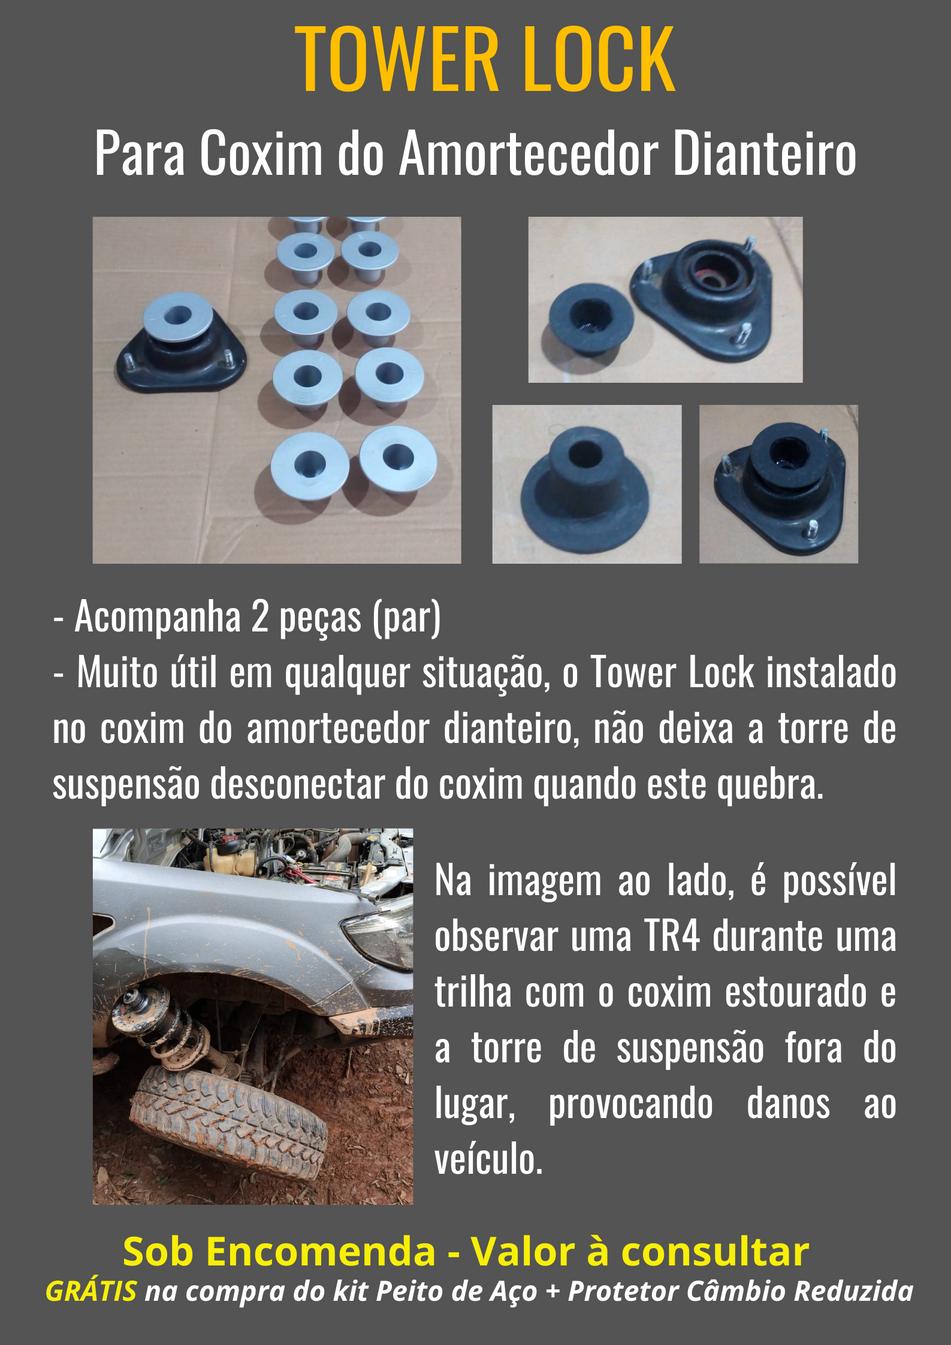 Tower Lock